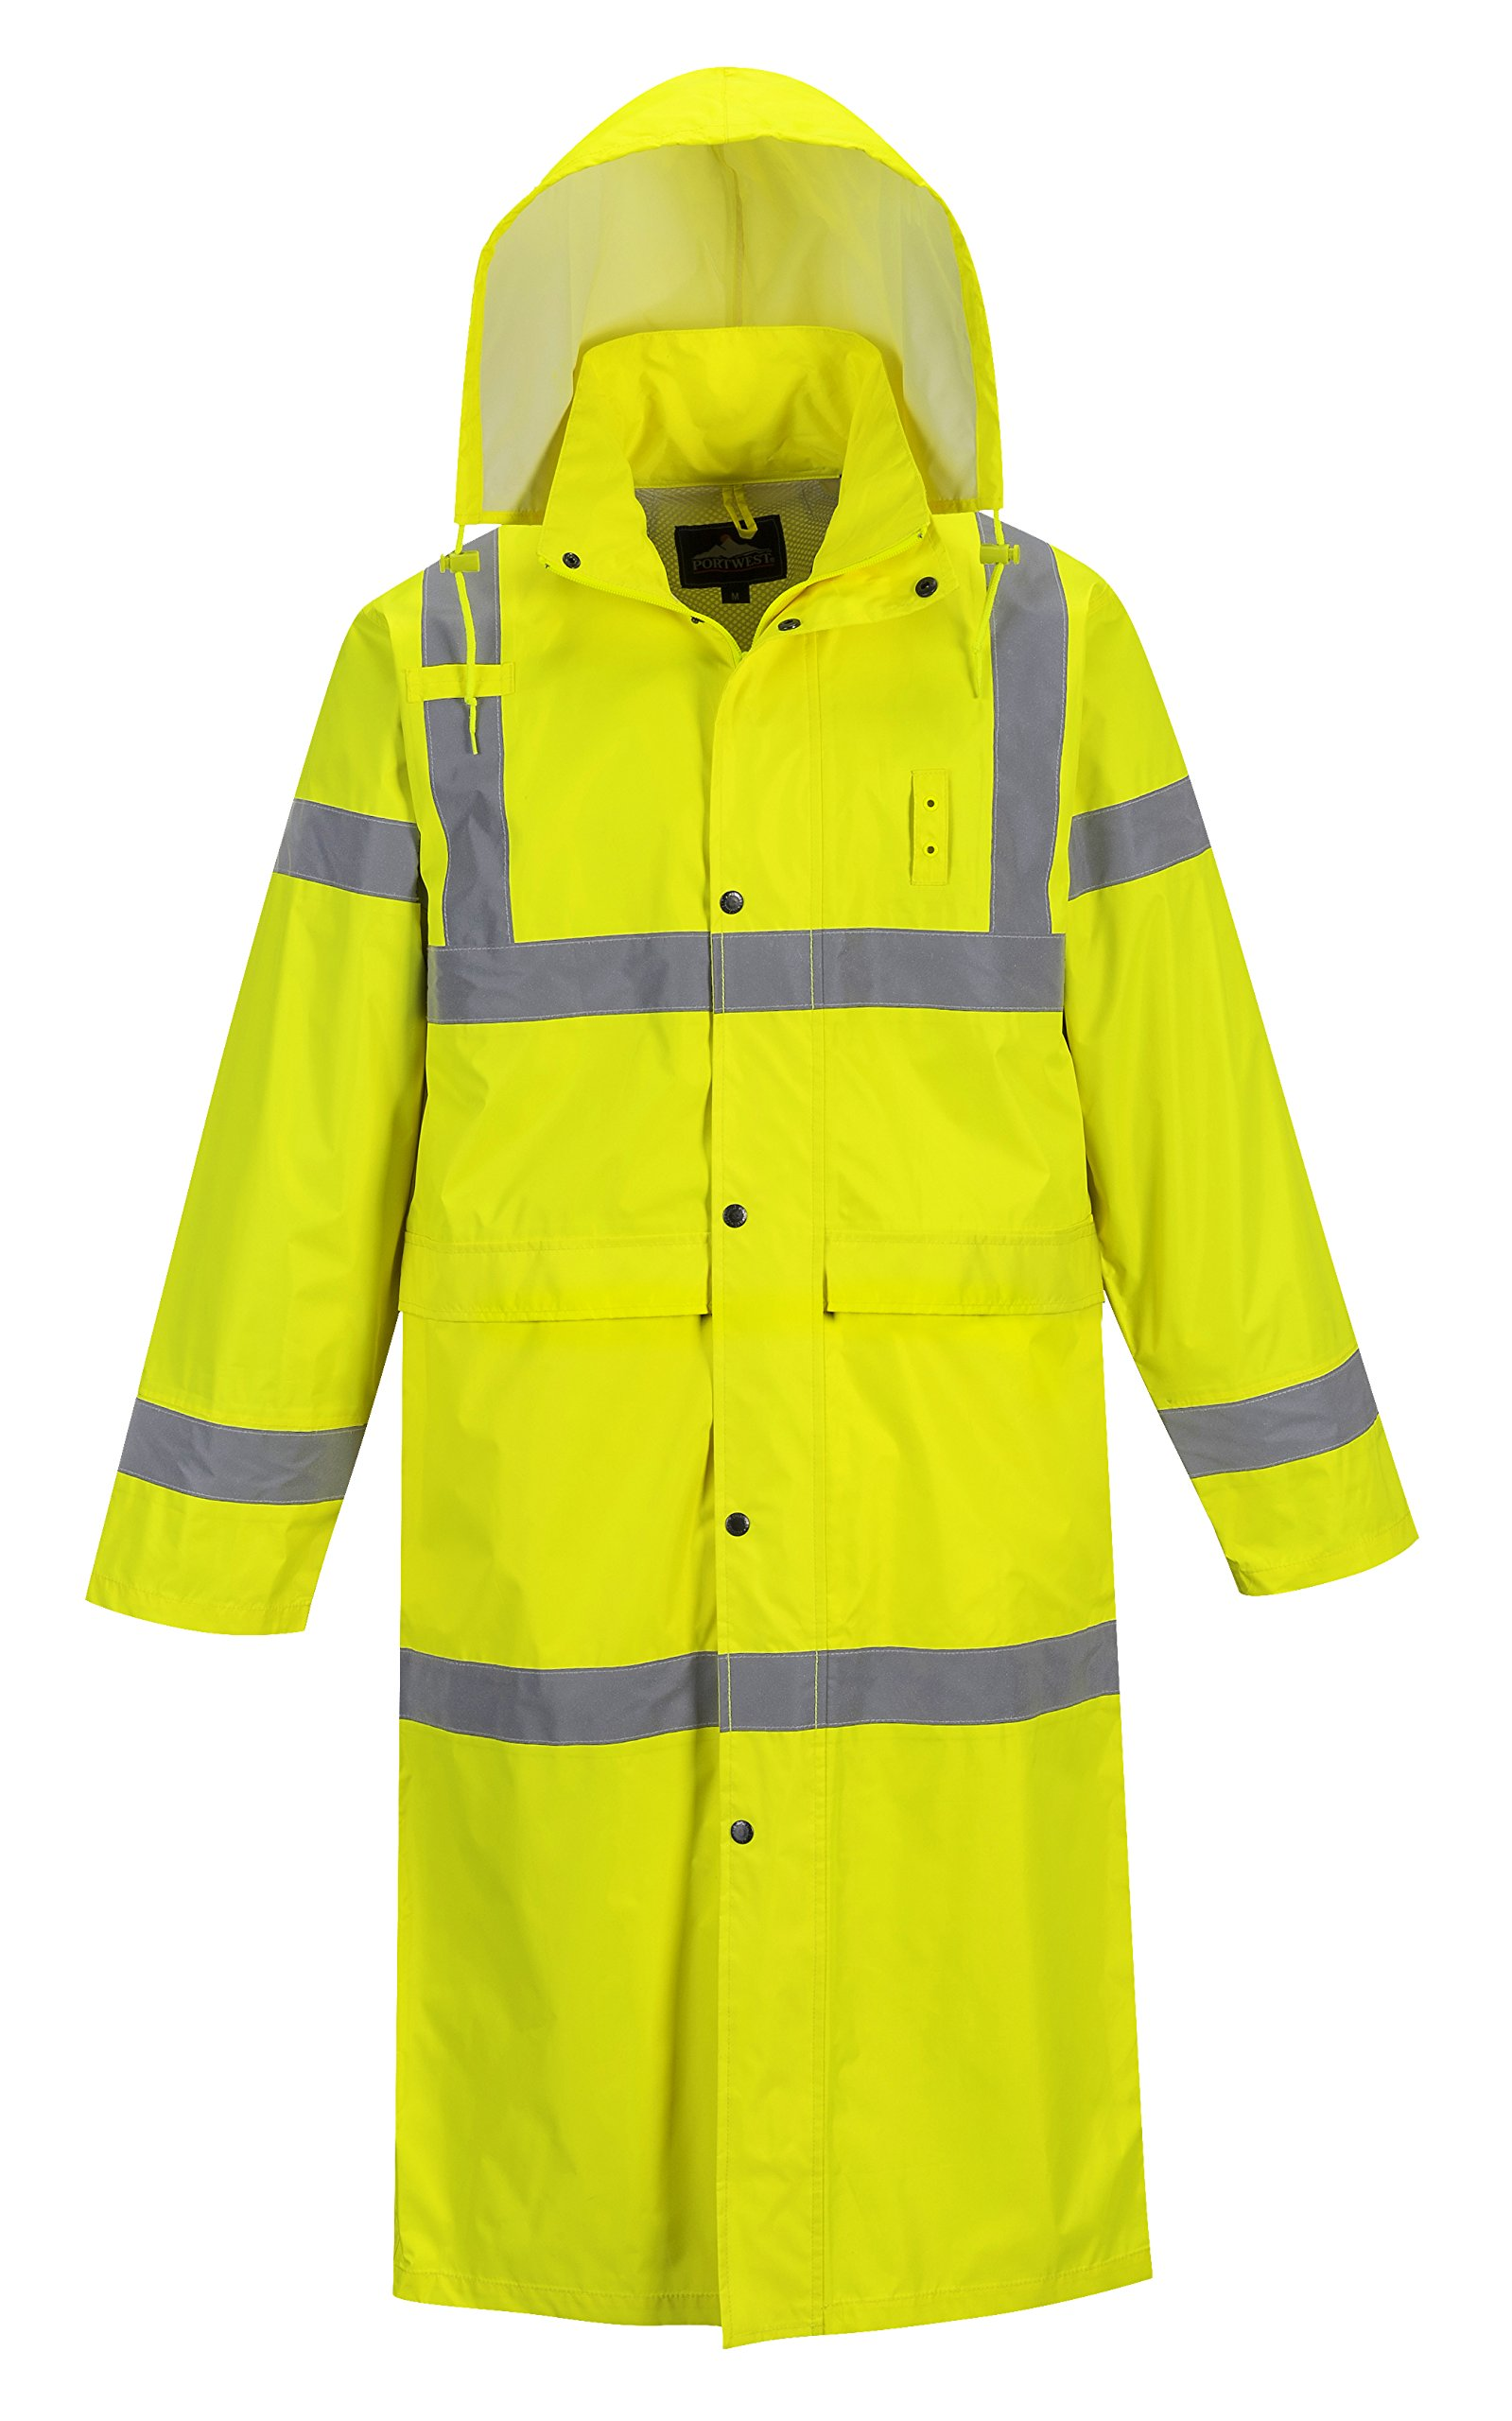 Portwest UH445 Hi Vis Classic Rain Coat 48'' Long Waterproof Rain Jacket with Hood (4XL (56-58in), Yellow) by Portwest